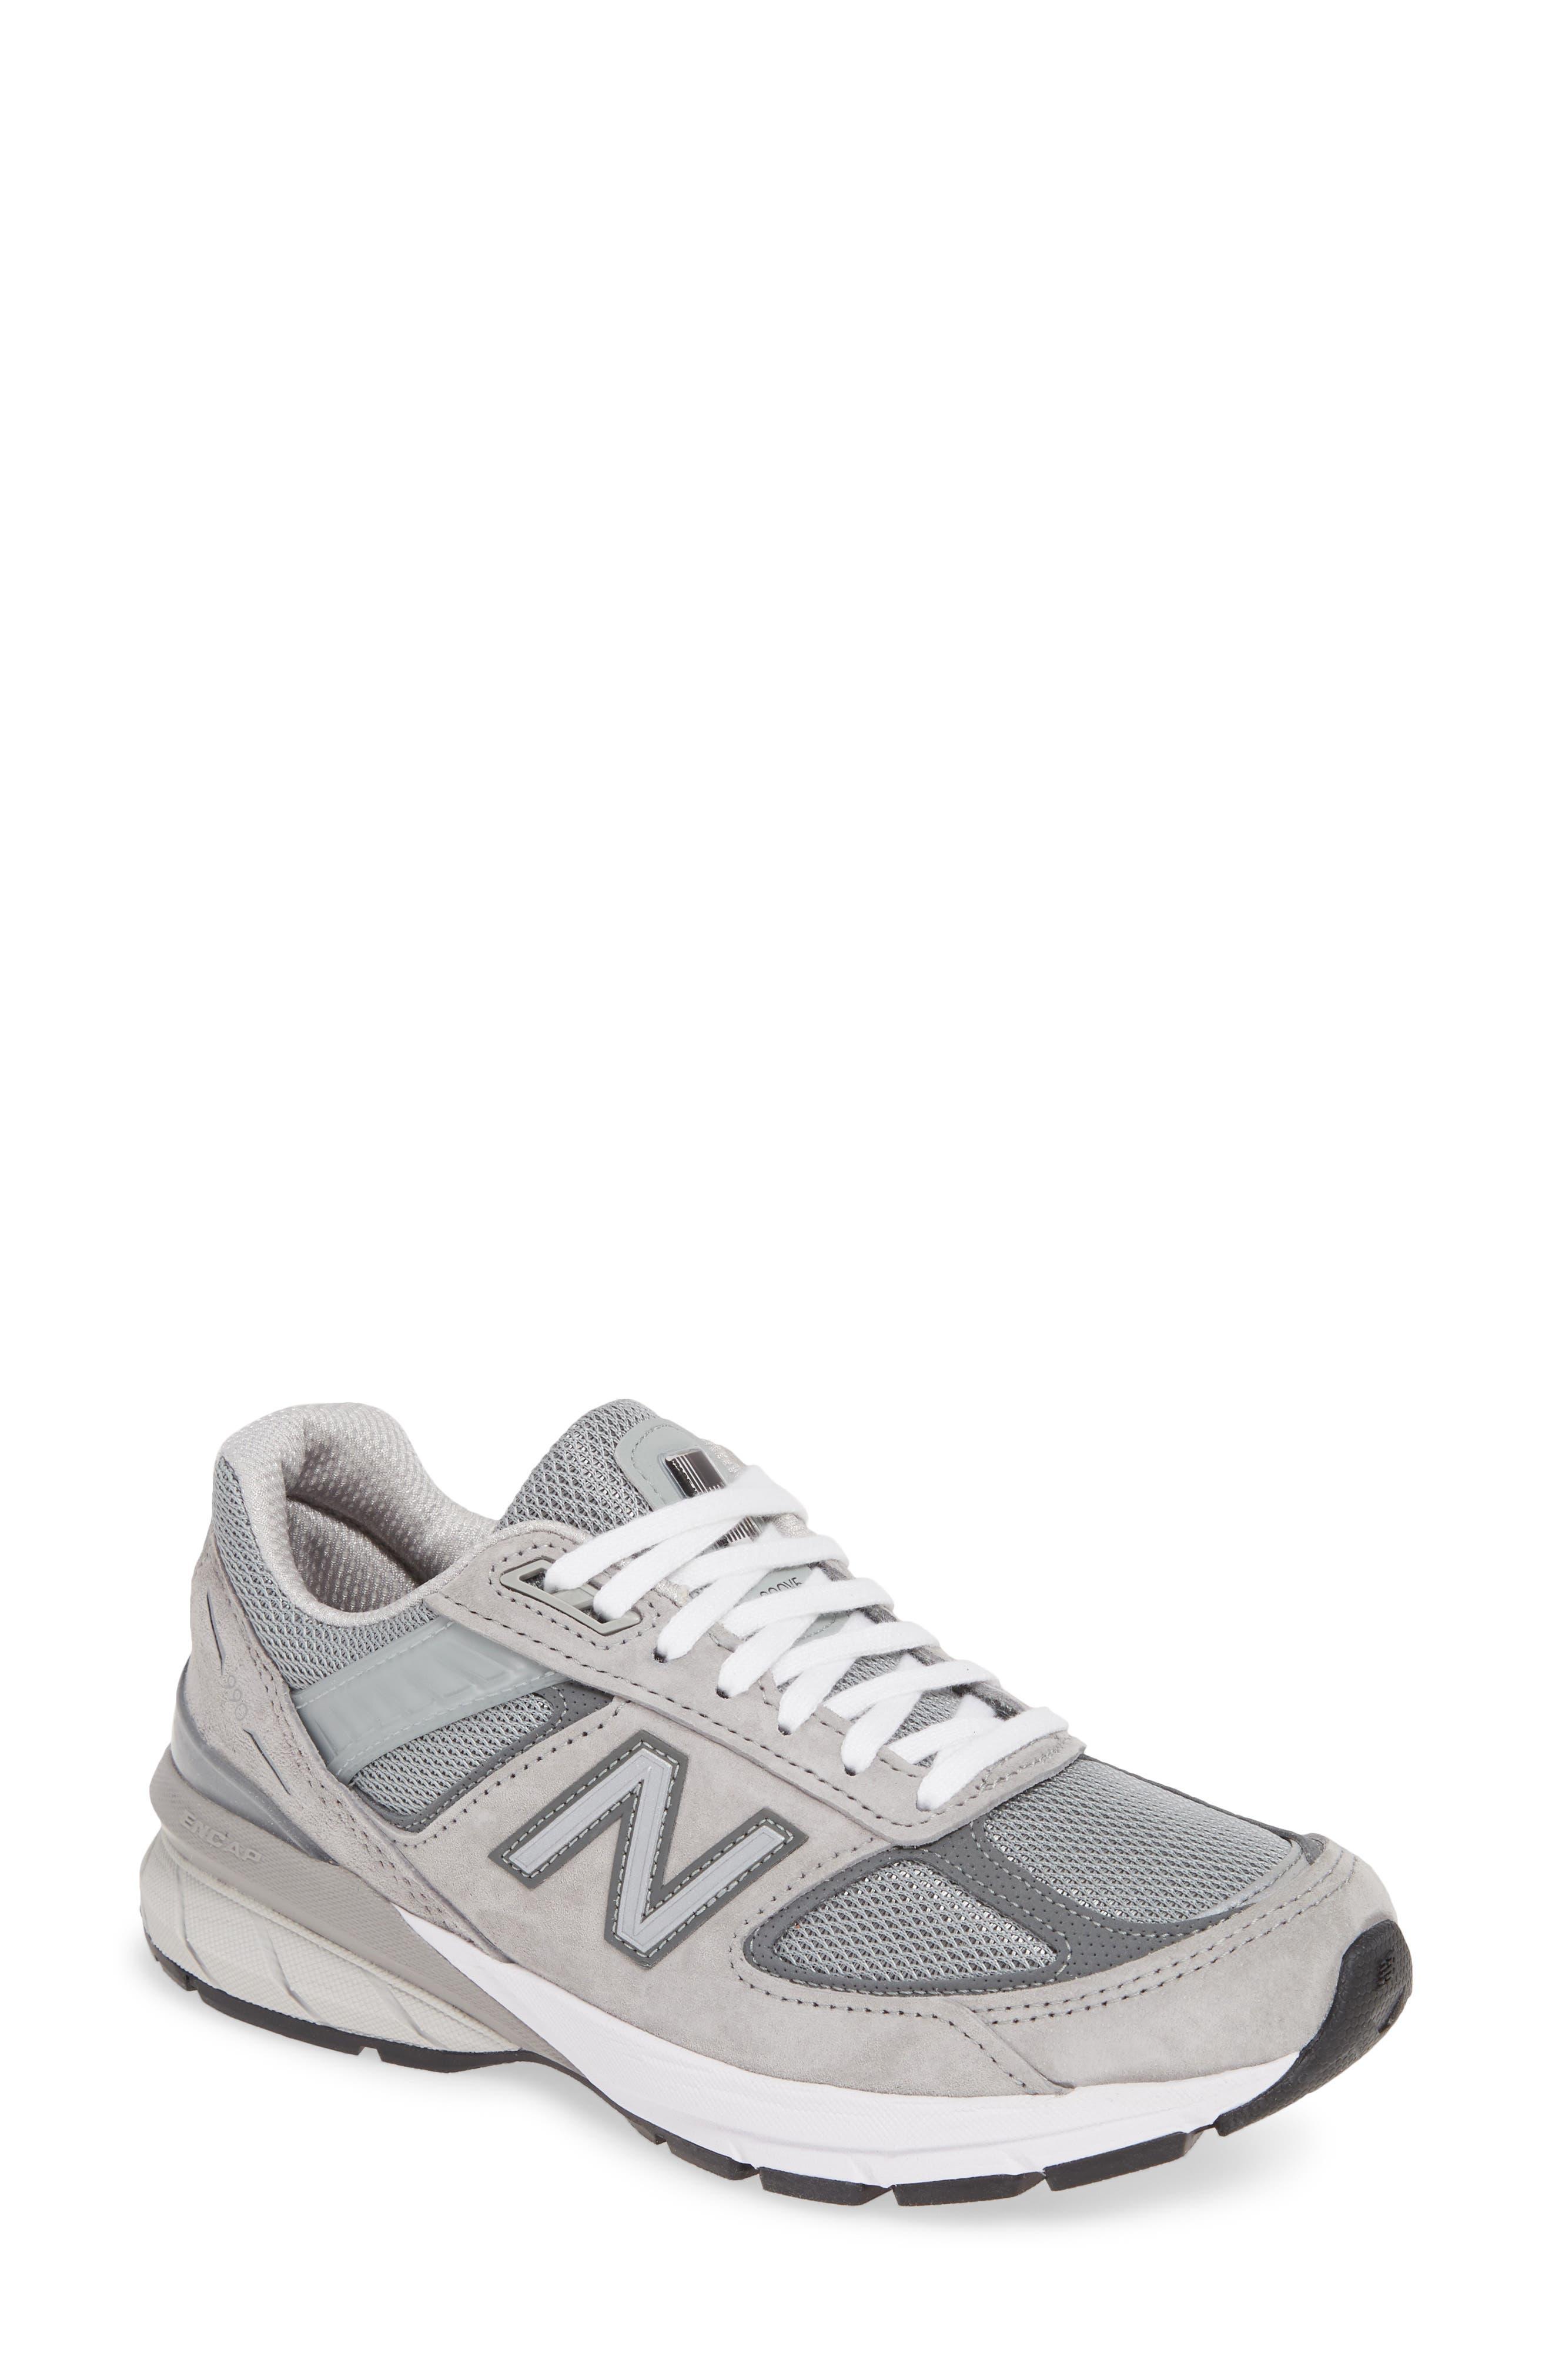 new balance cw620 white